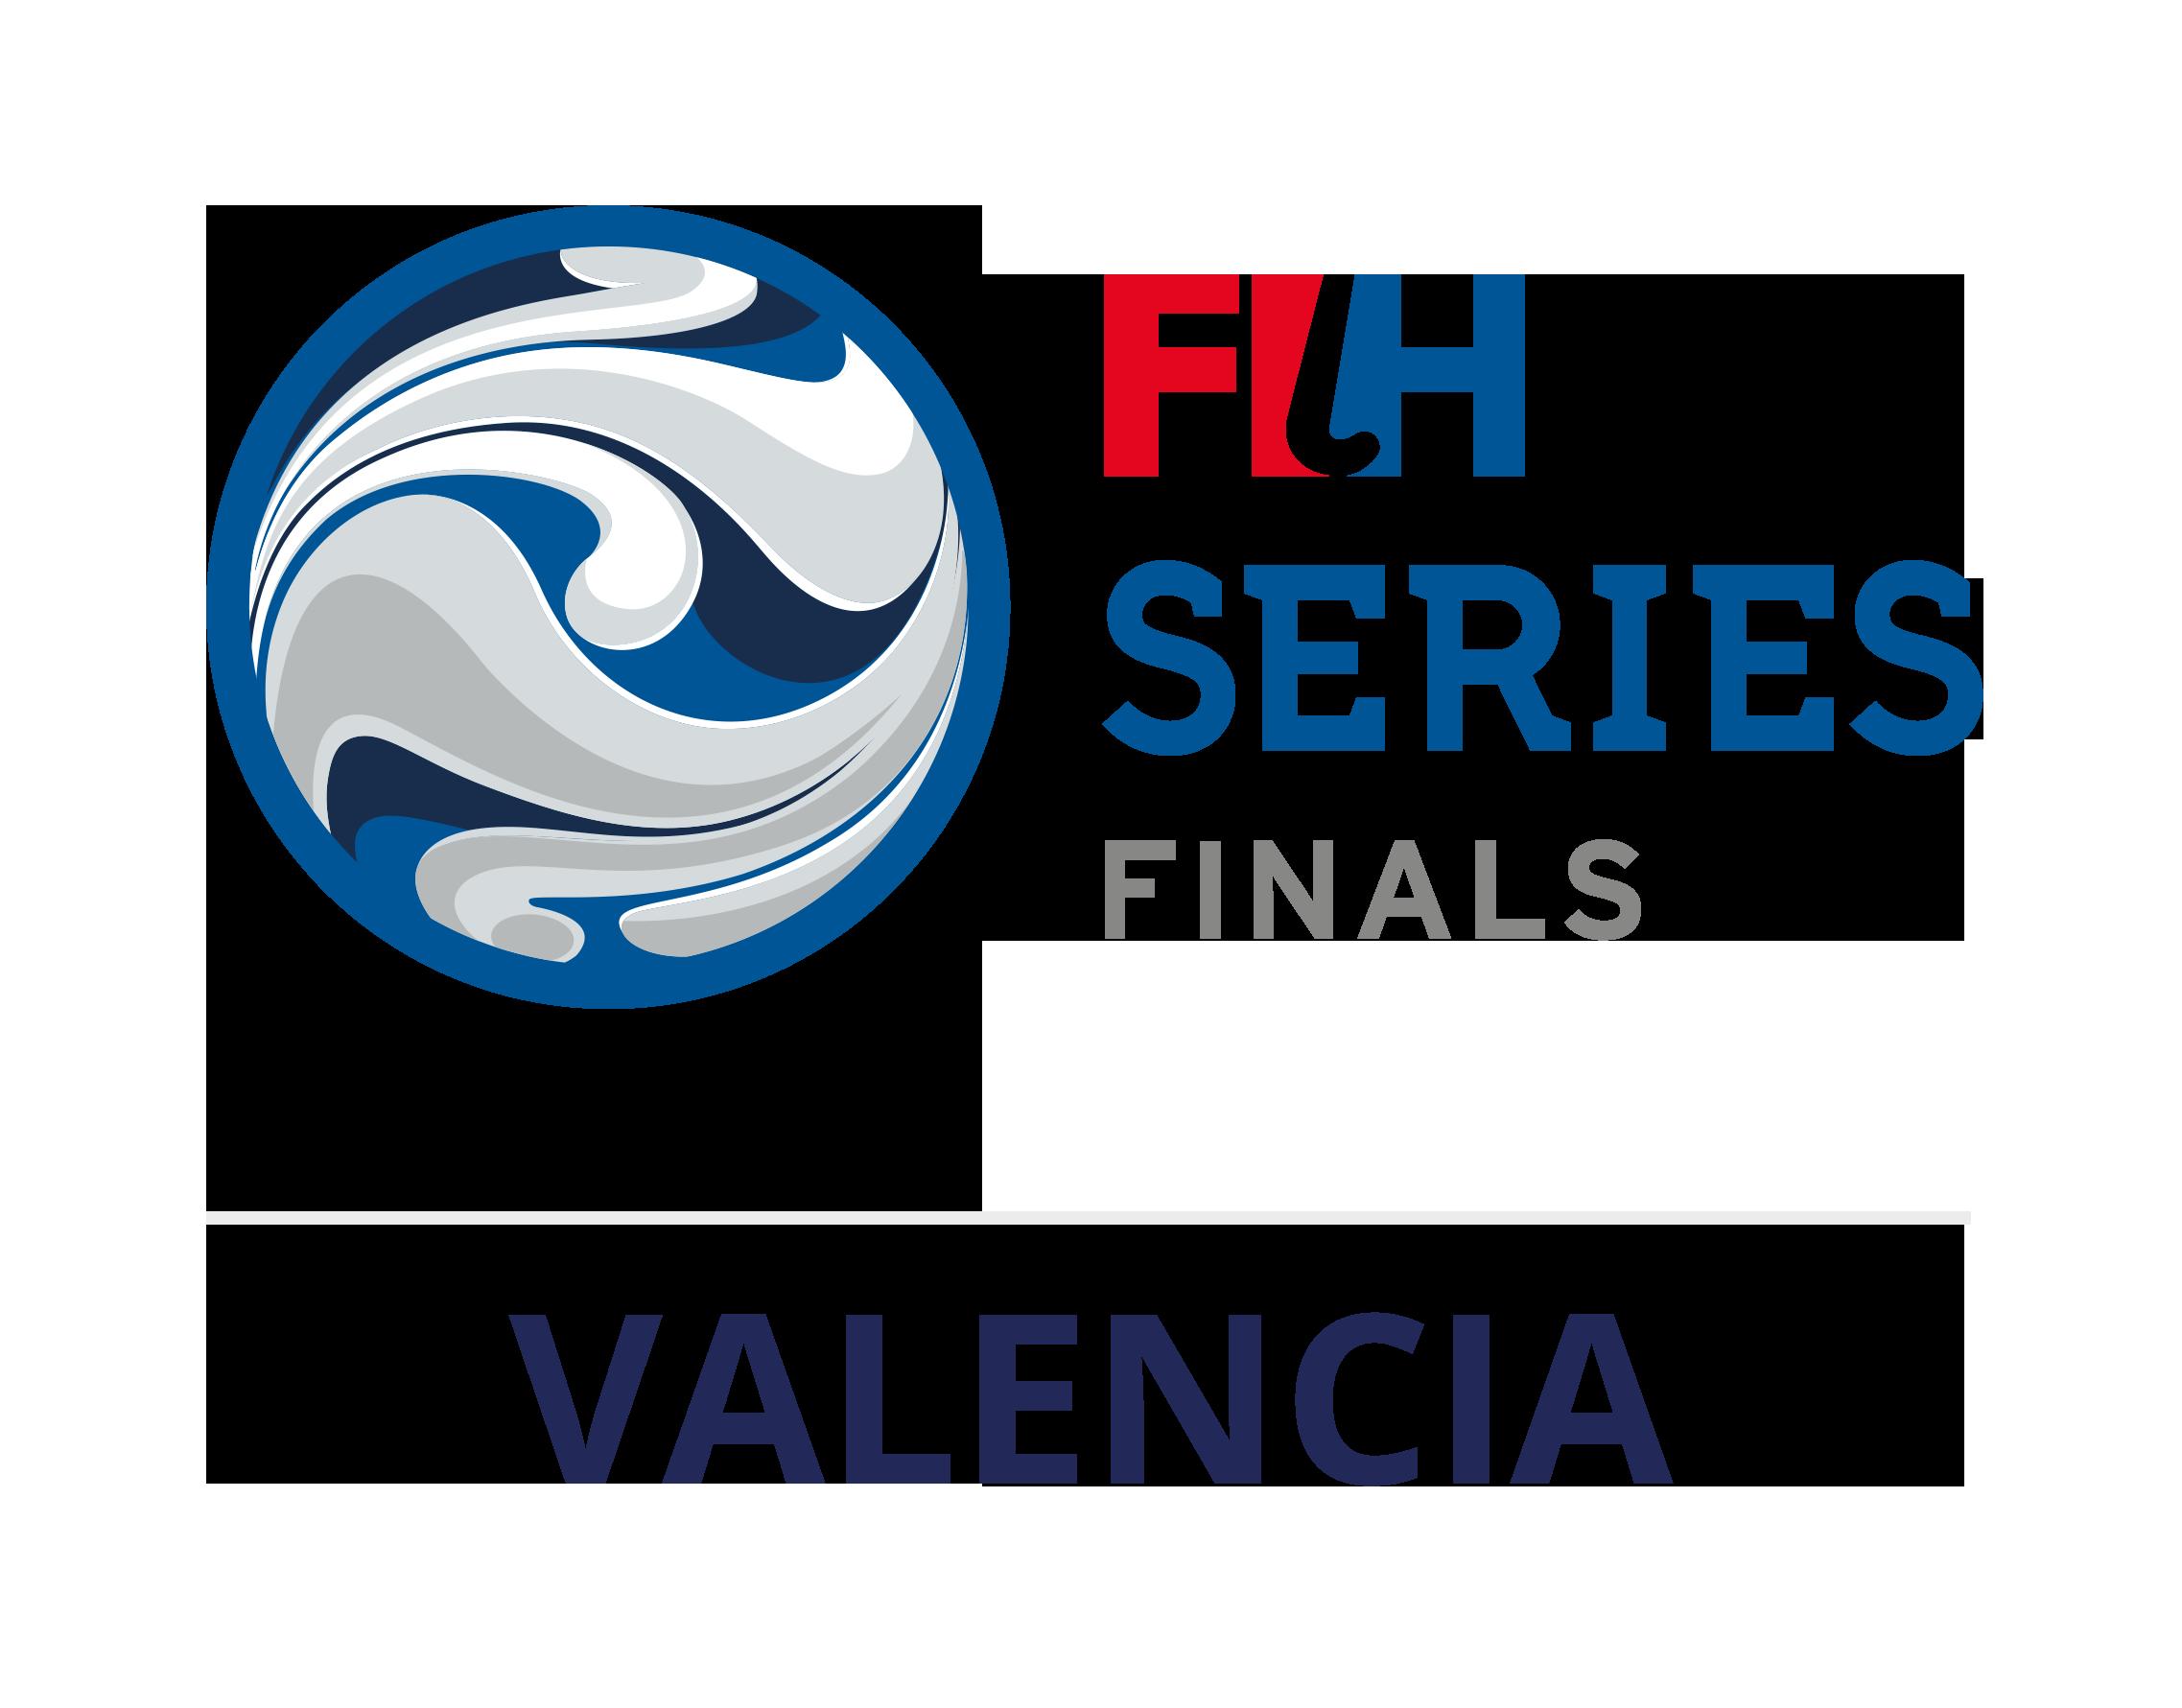 Logo FINAL SERIES 2019